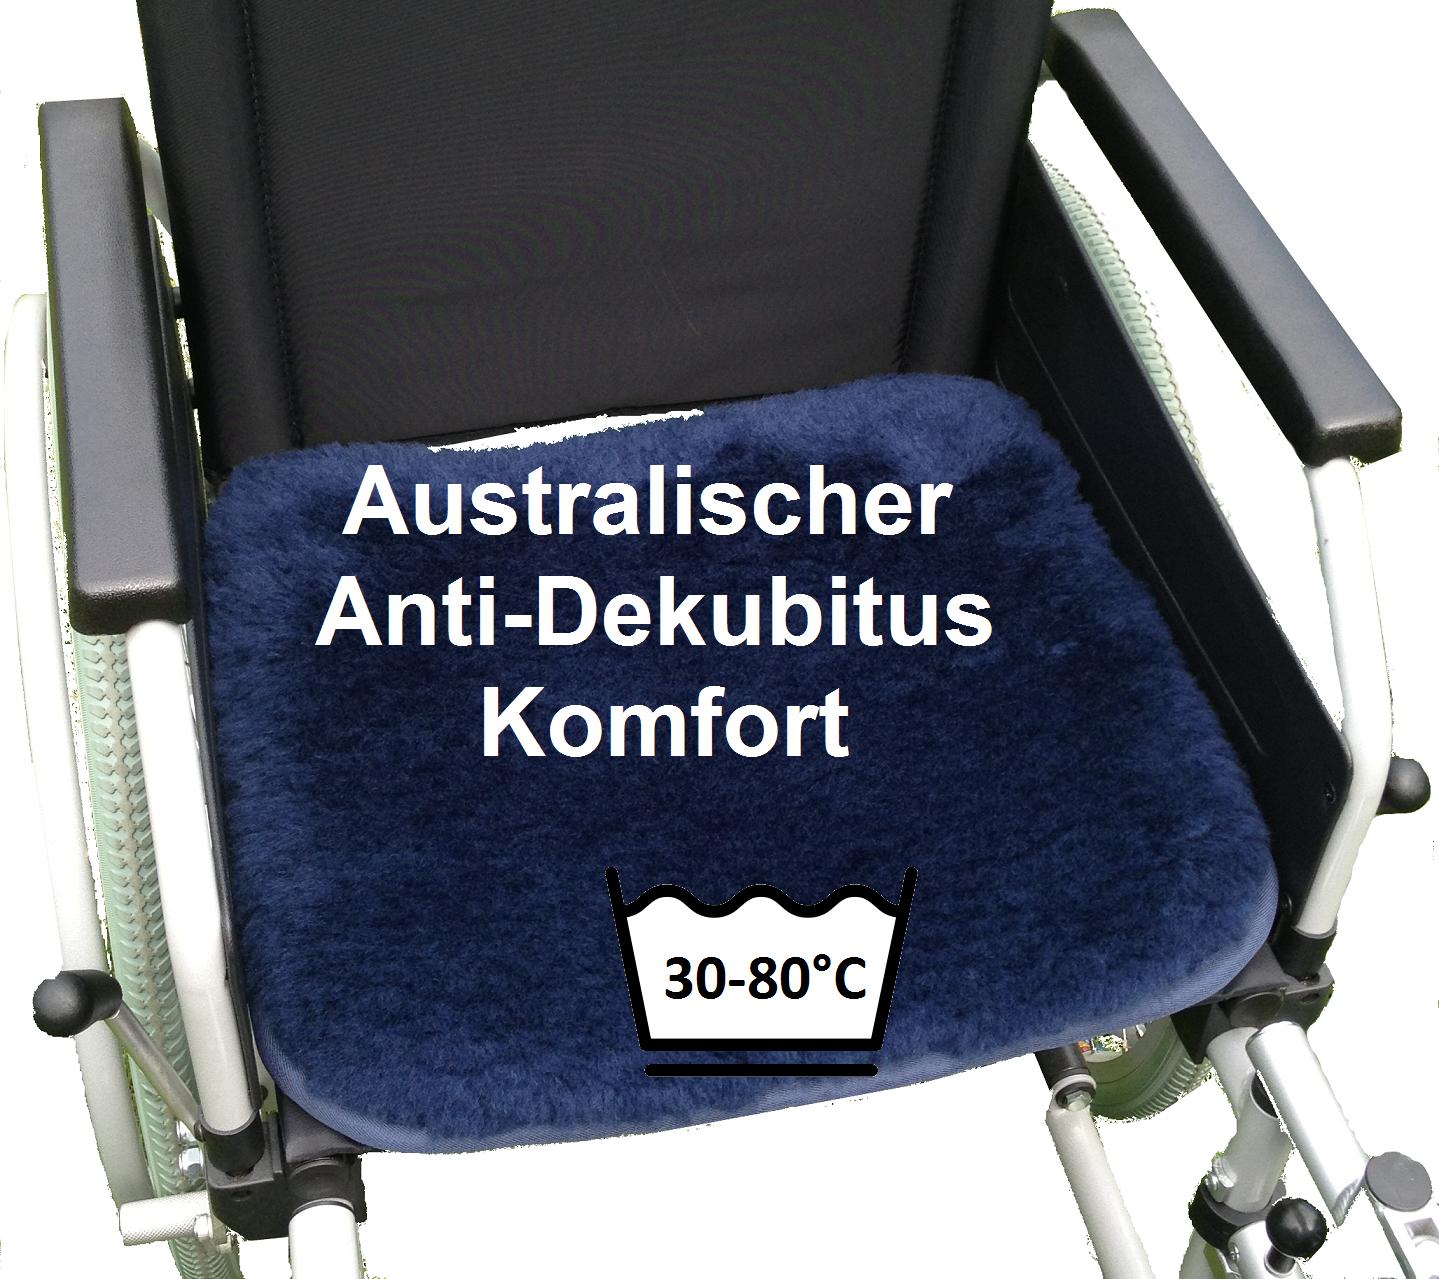 Australische Antidekubitus Sitzauflage Rollstuhl